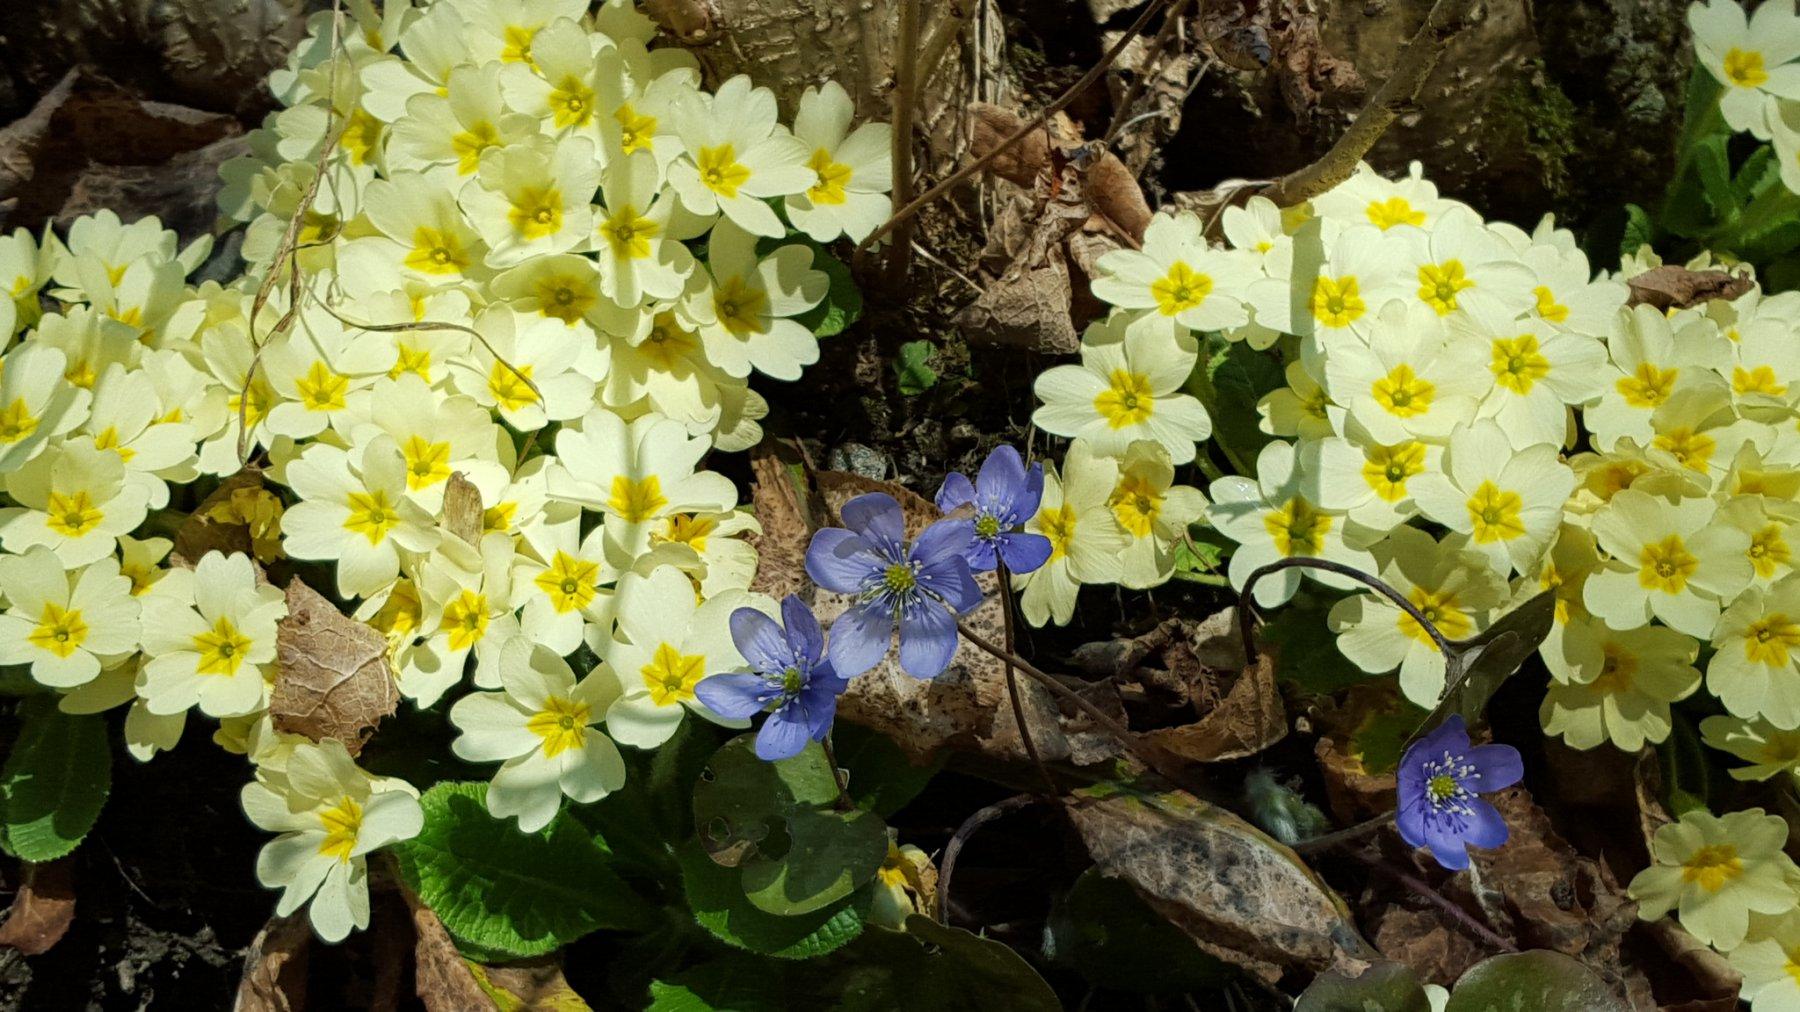 ... distese di primule altri fiori.